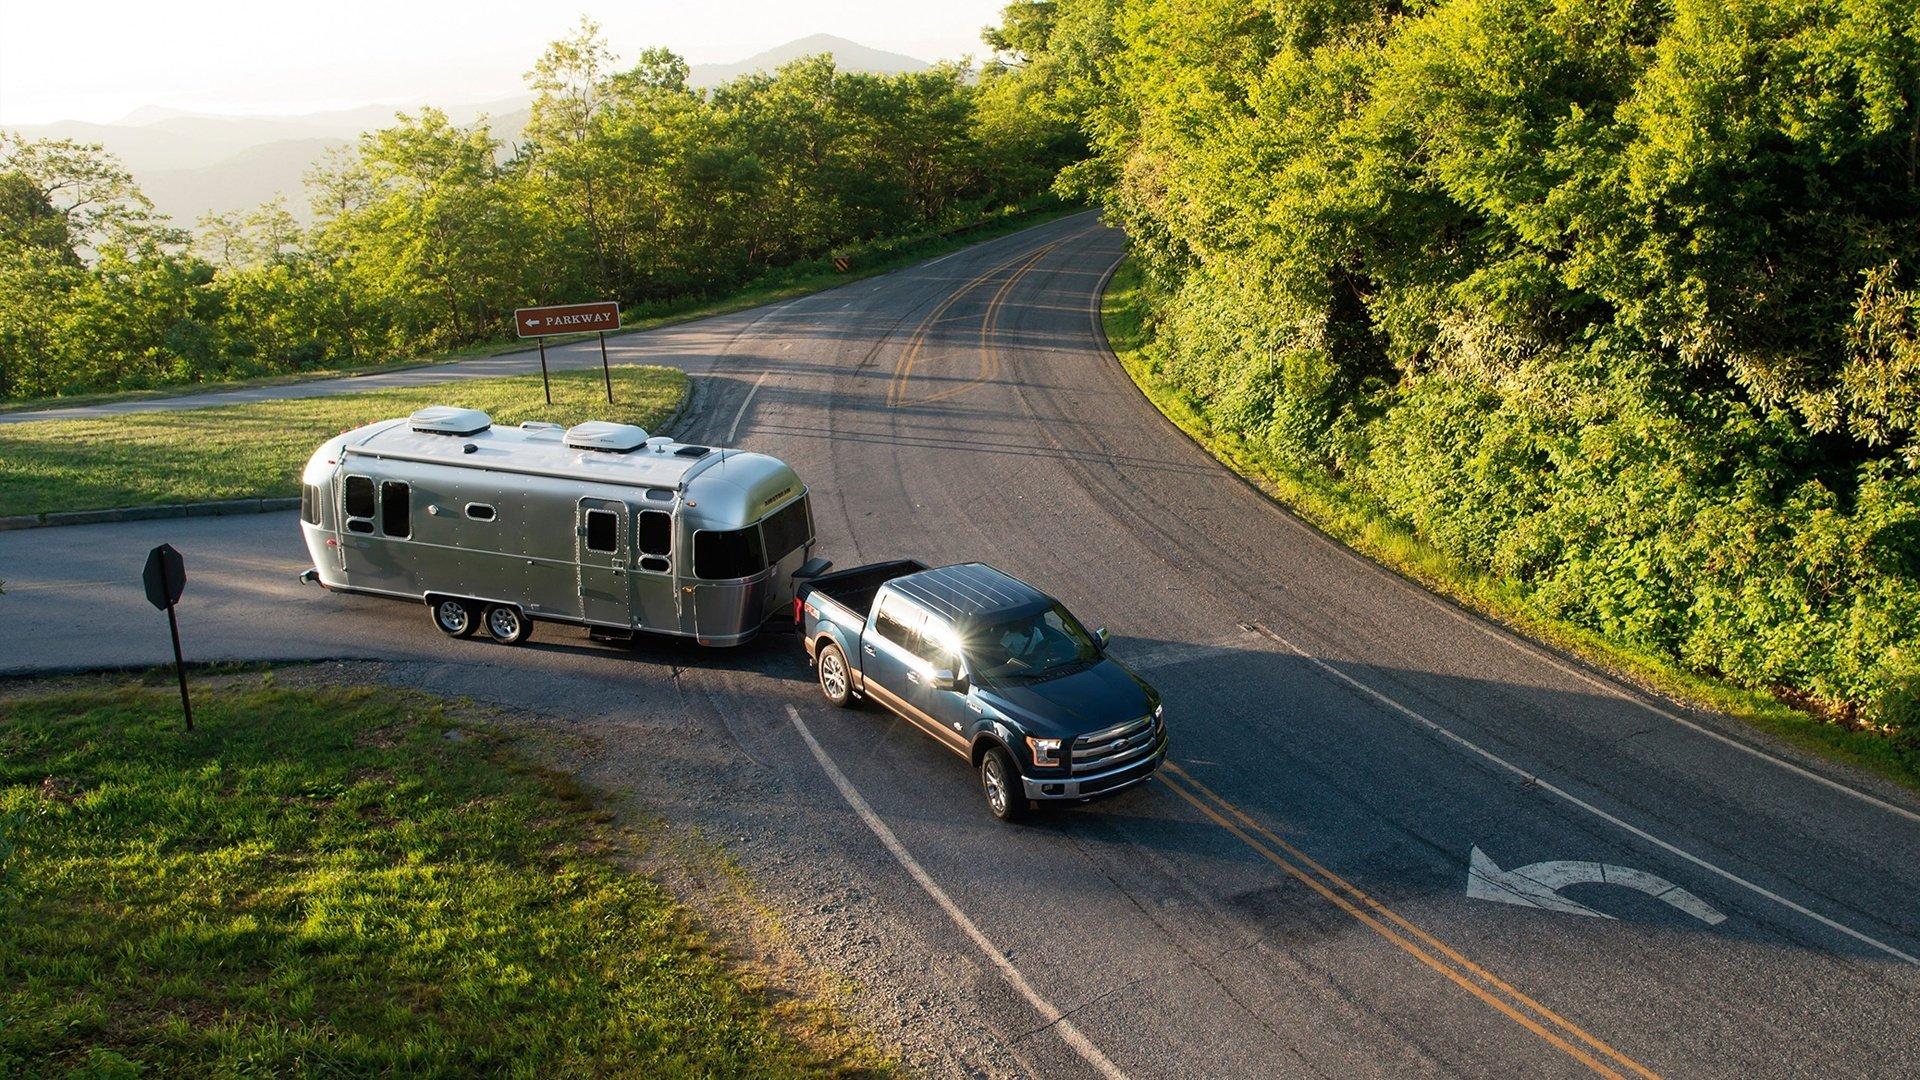 Airstream build quality and longevity